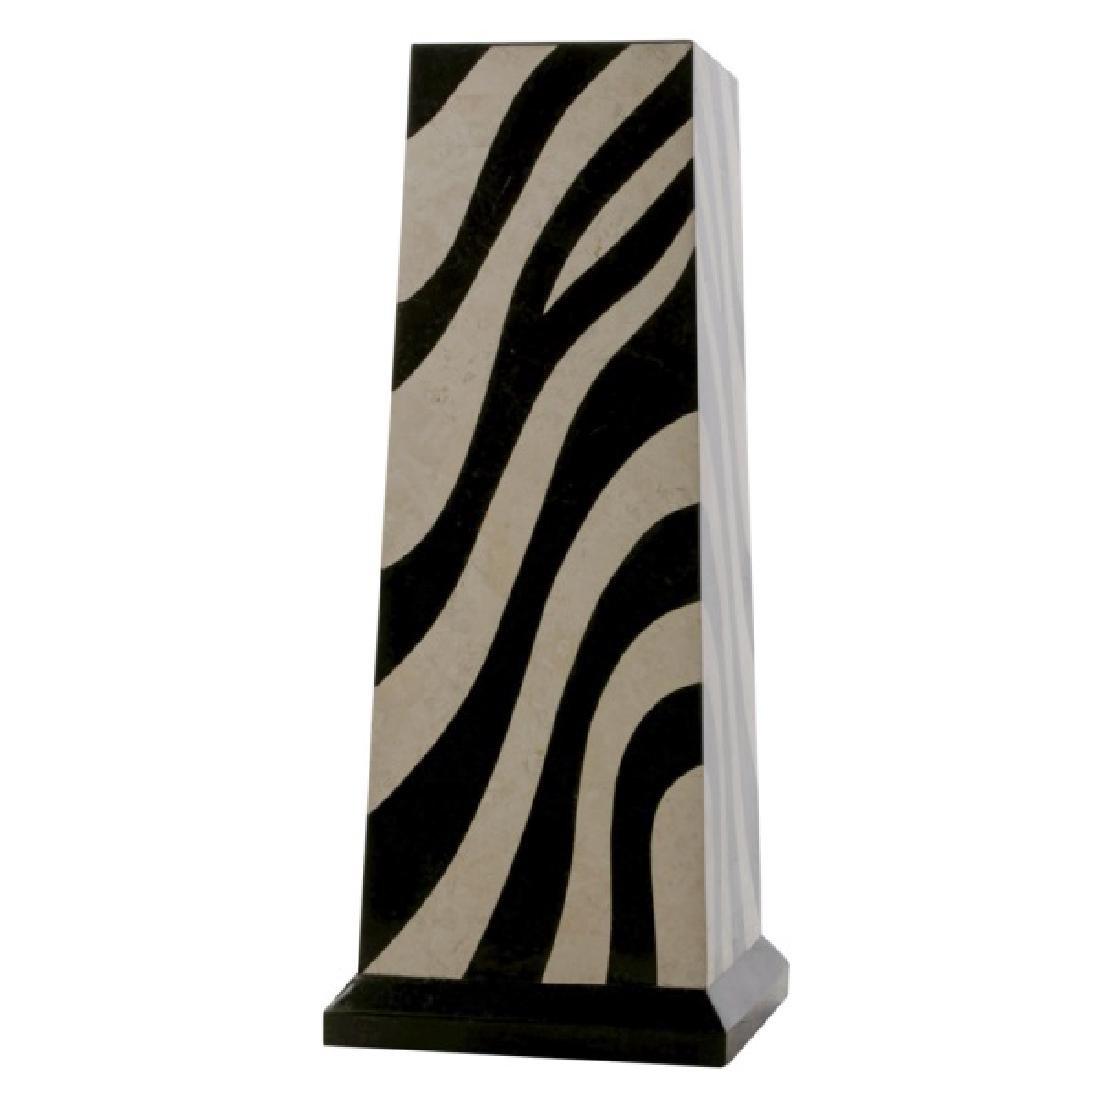 Stone Zebra Motif Pedestal, Maitland-Smith